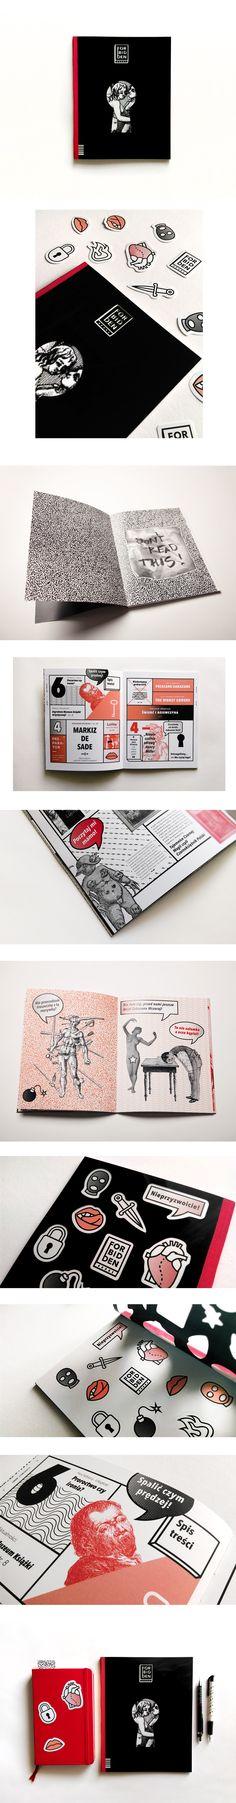 Katarzyna Wieteska - Layout and editorial design of Forbidden Books Magazine created at Editorial And Typography Design Studio of prof. Sławomir Kosmynka at Academy of Fine Arts in Łódź.  #magazine #cover #editorial #layout #design